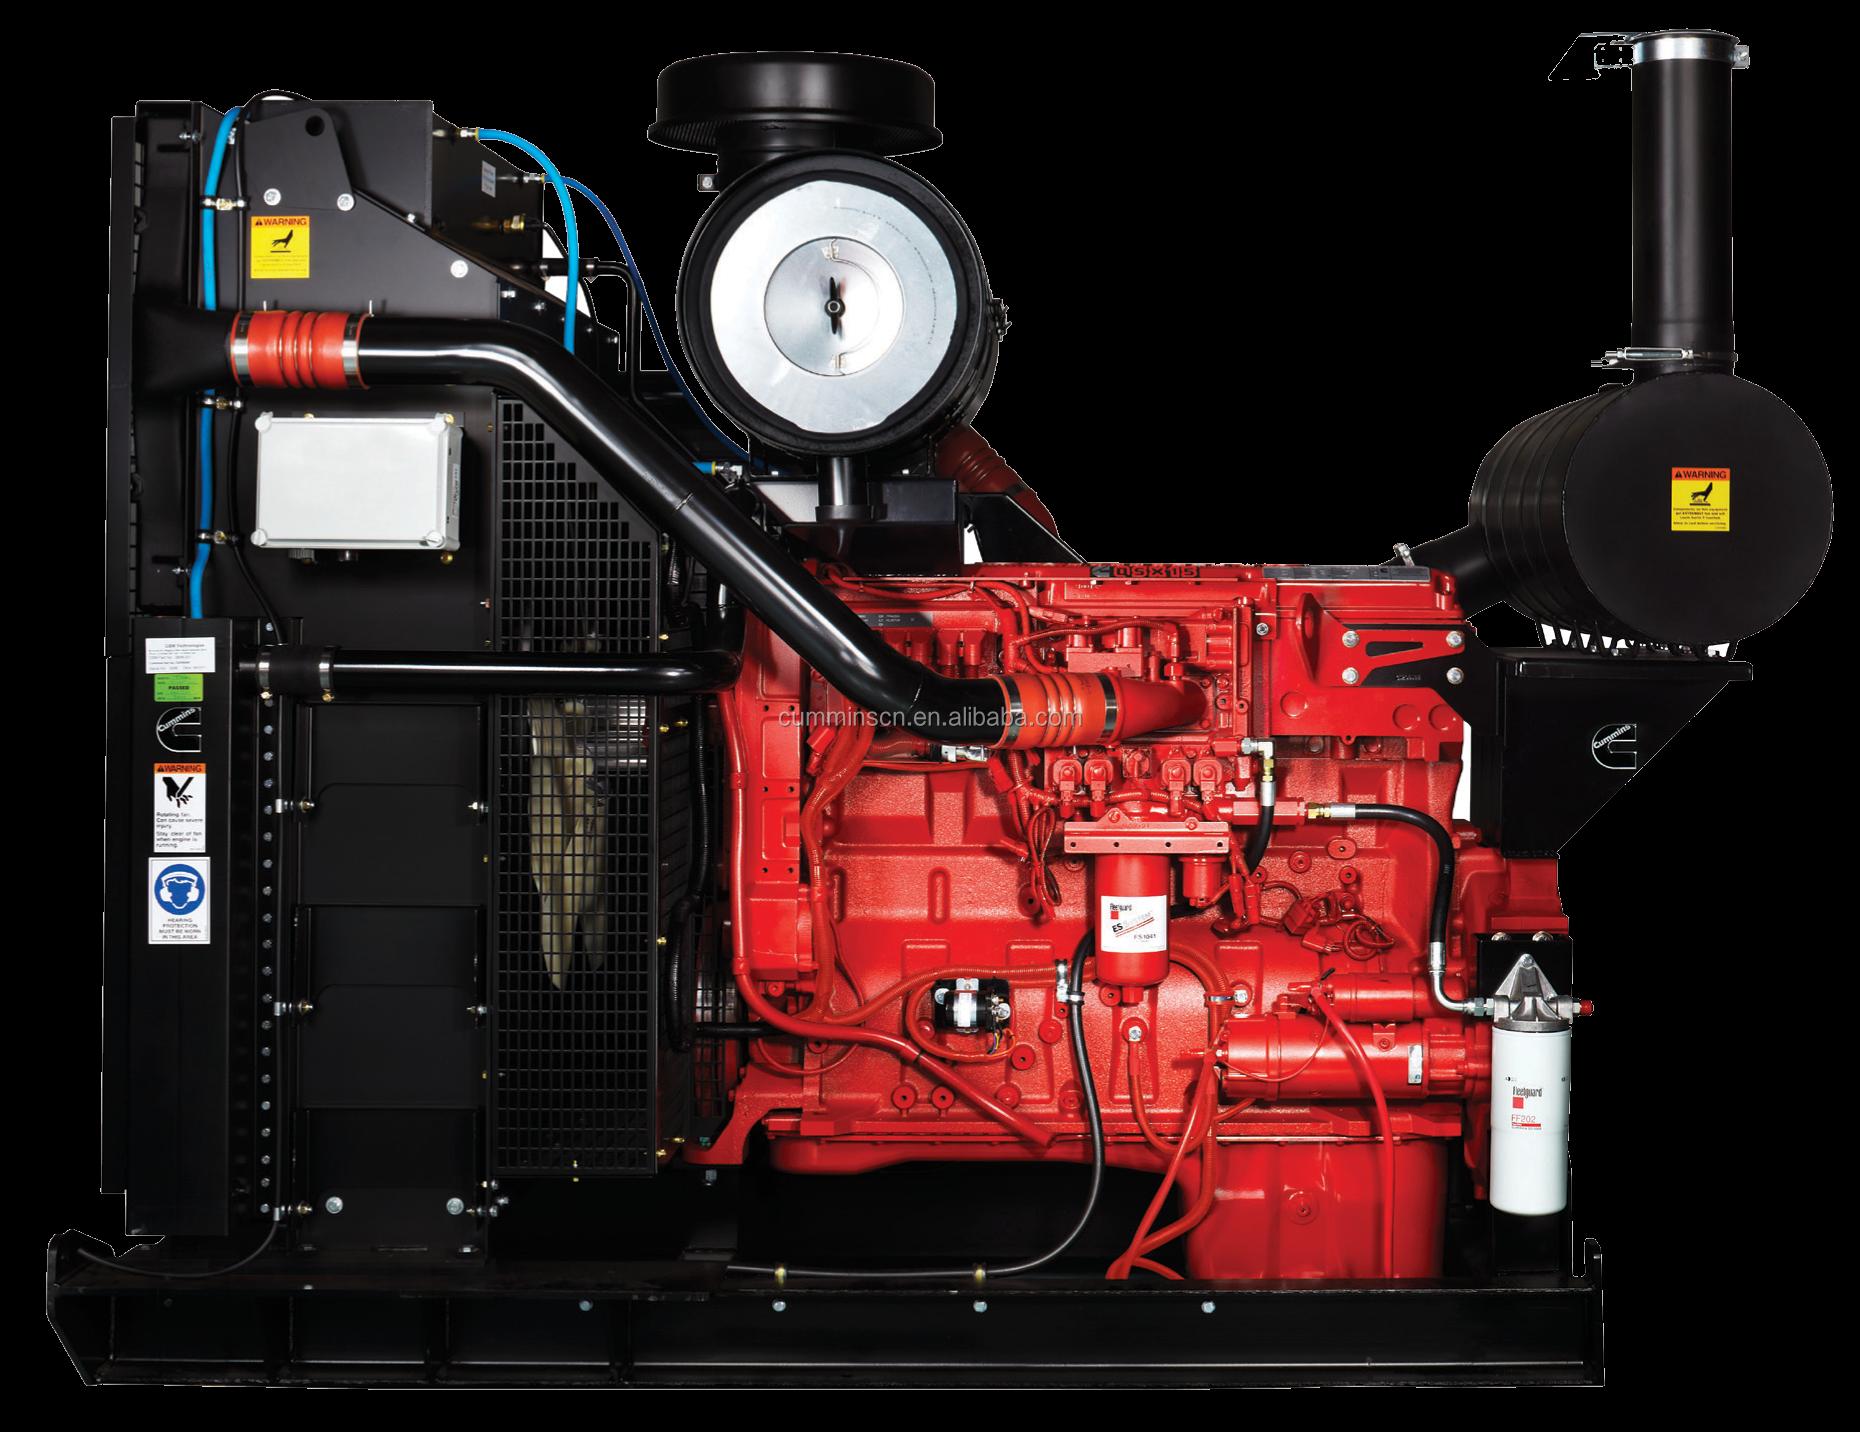 Cummins Diesel Engine QSX15 QSX 525hp 600hp Cummins powerpacks Mine de-watering pumps Hydraulic powerpacks